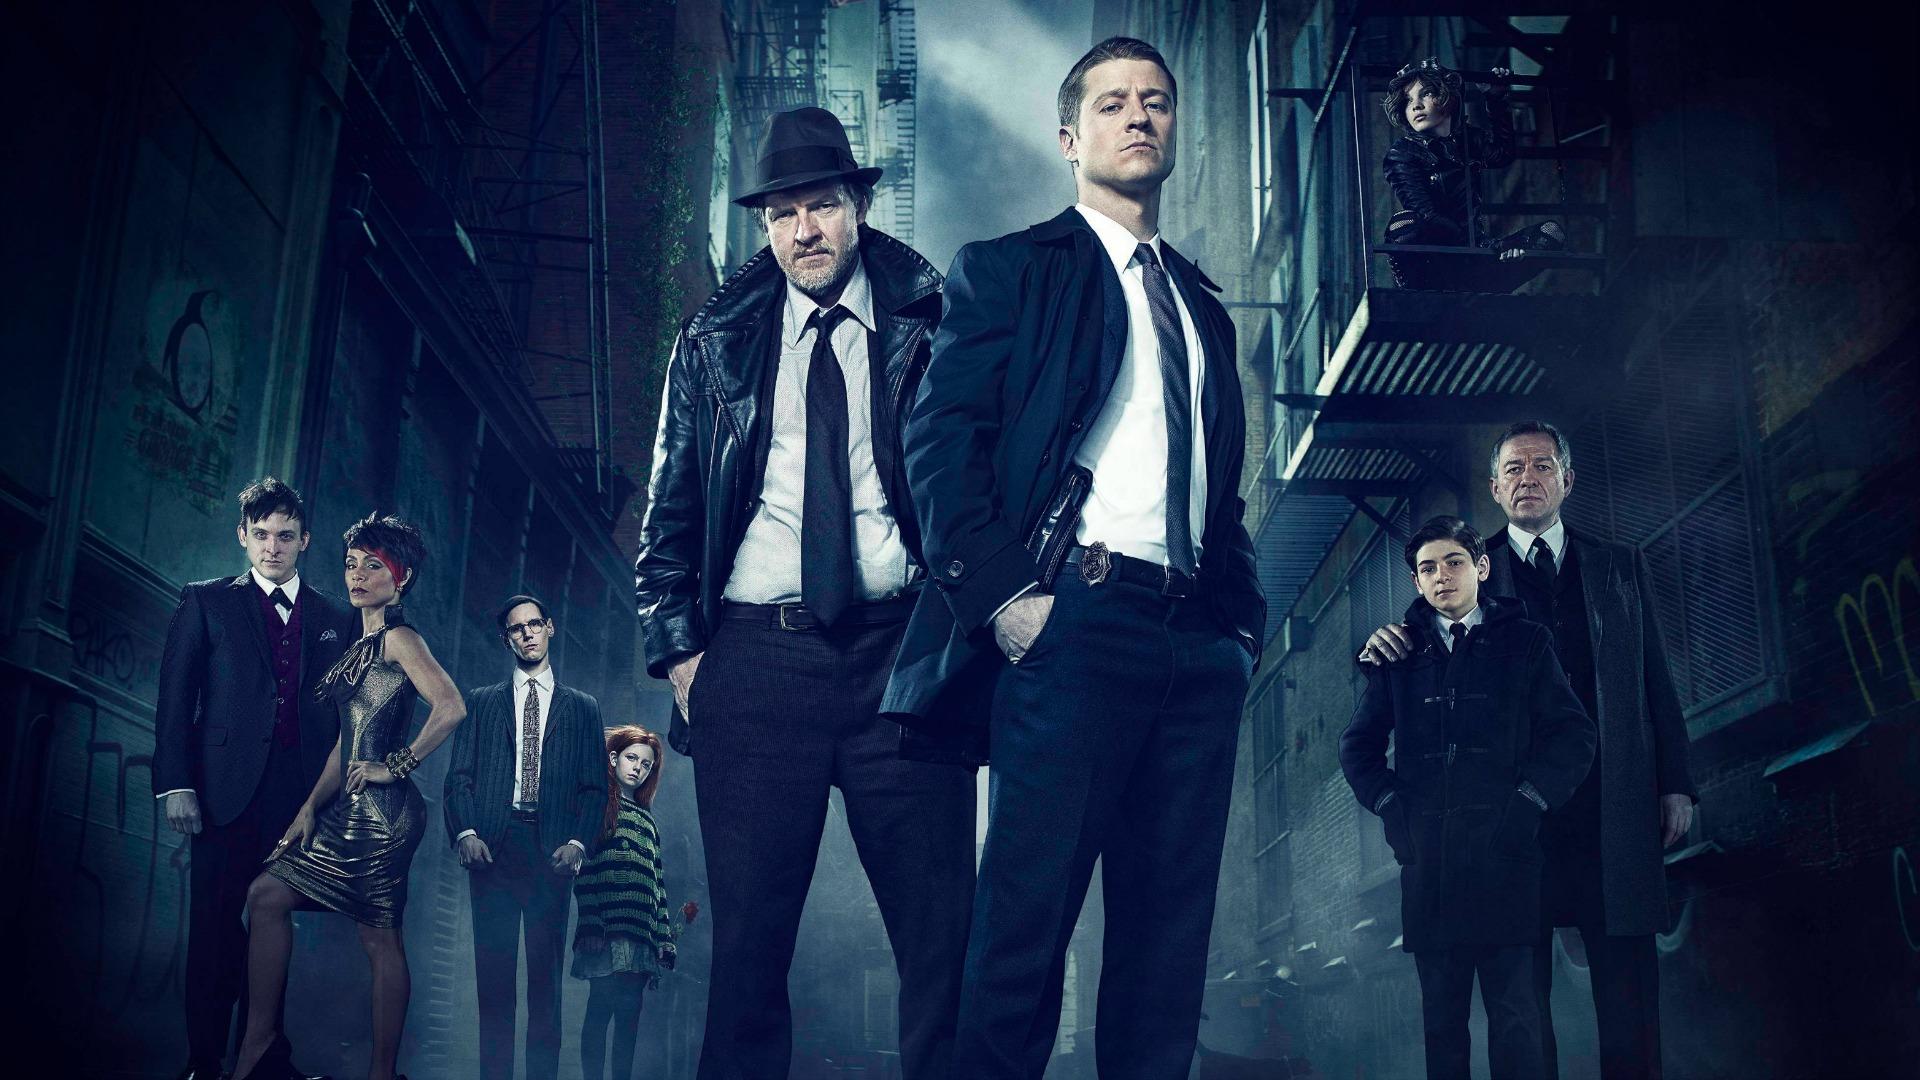 Gotham wallpaper 5